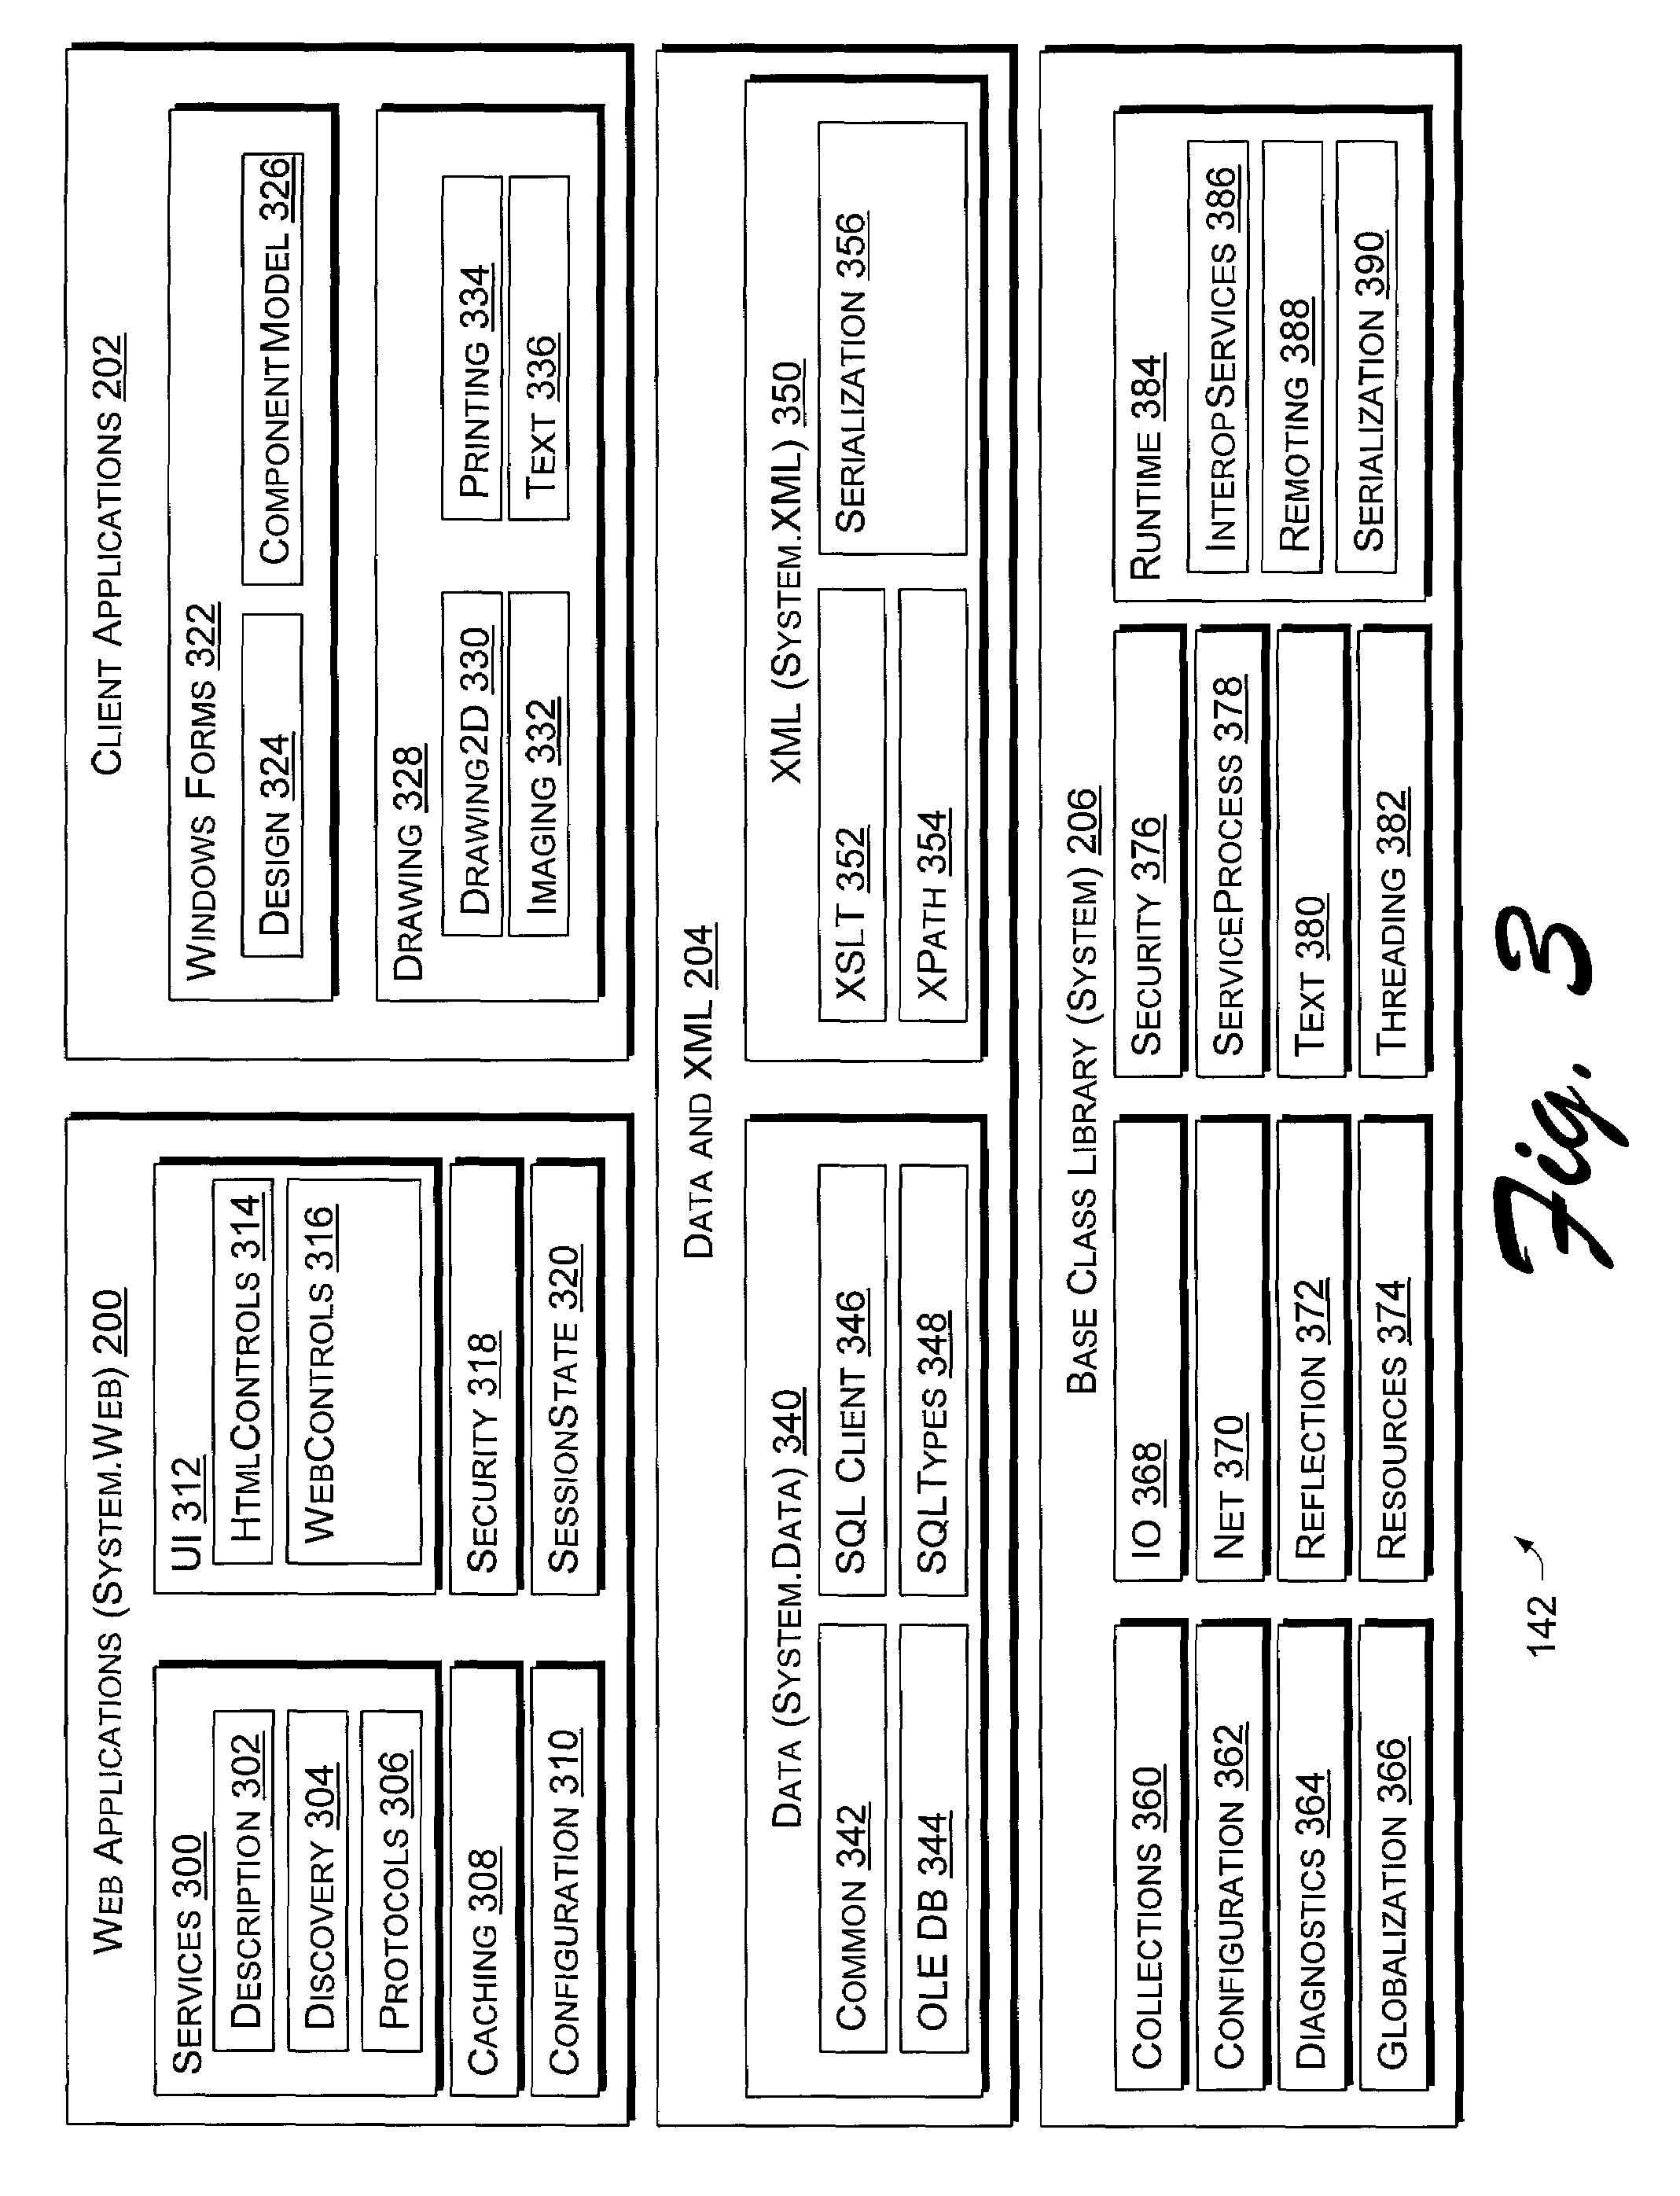 Patent US 7,546,602 B2